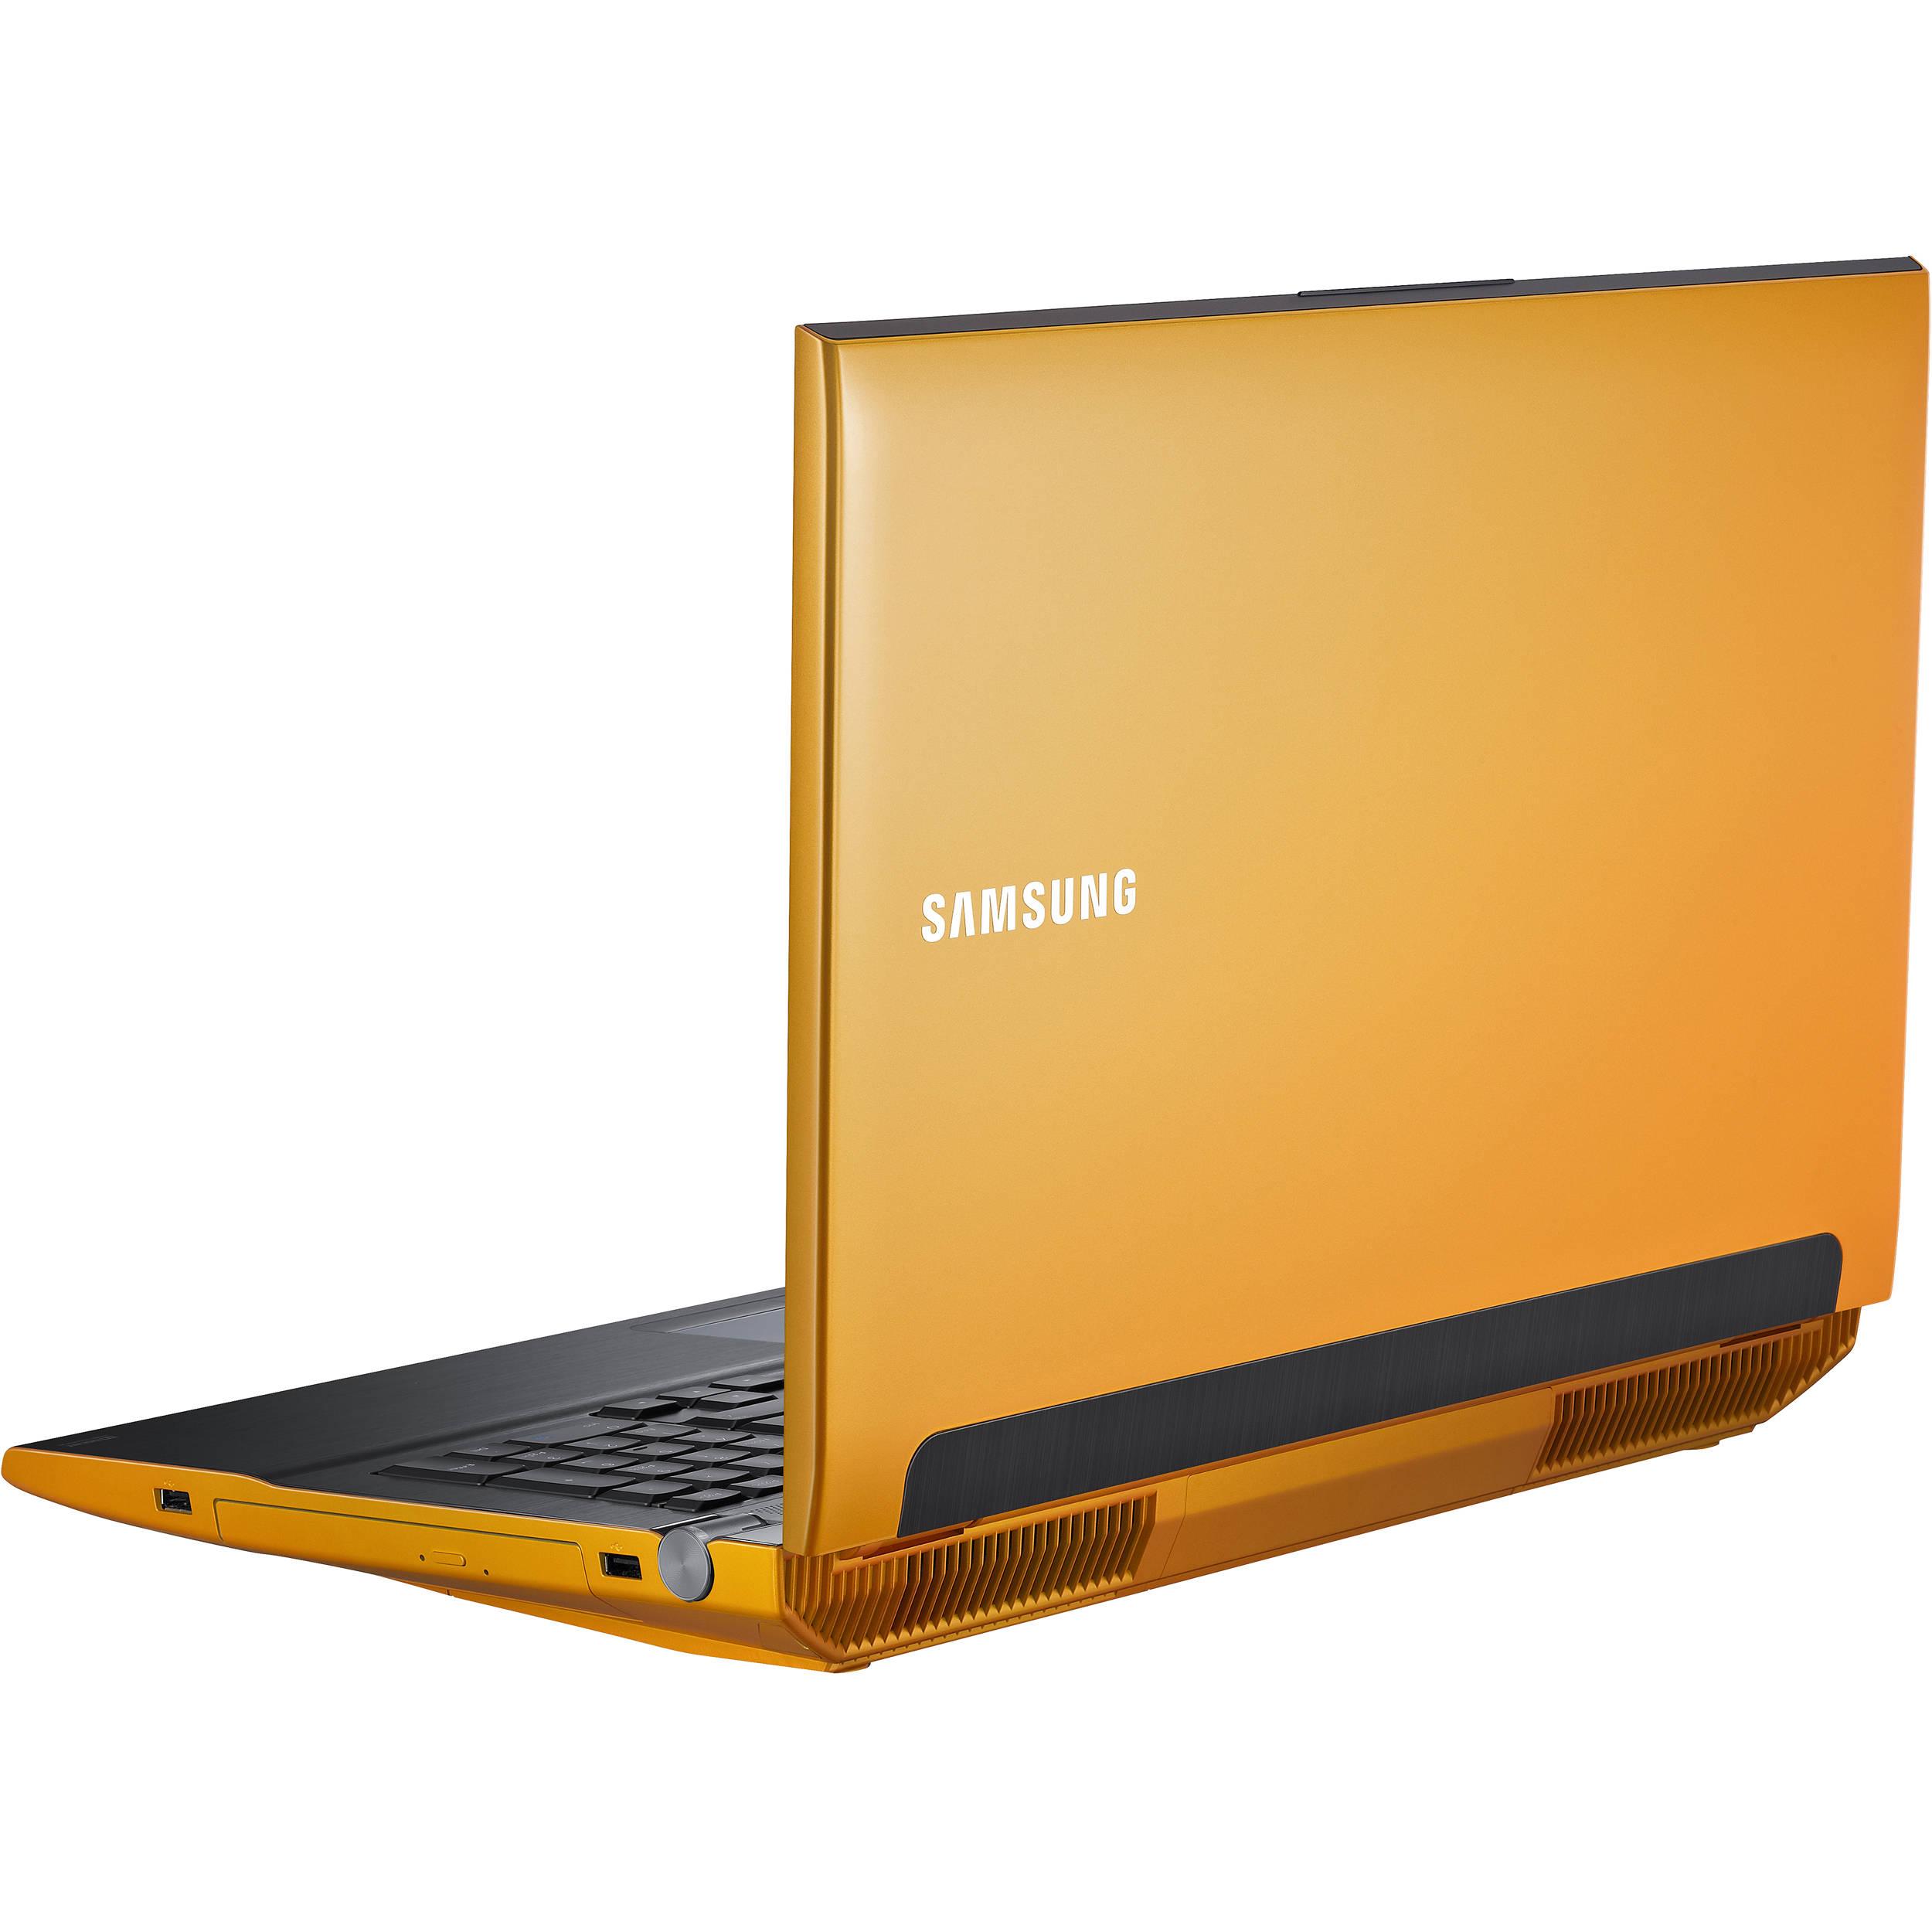 Samsung Series 7 Gamer Np700g7c T01us 17 3 Quot Np700g7c T01us